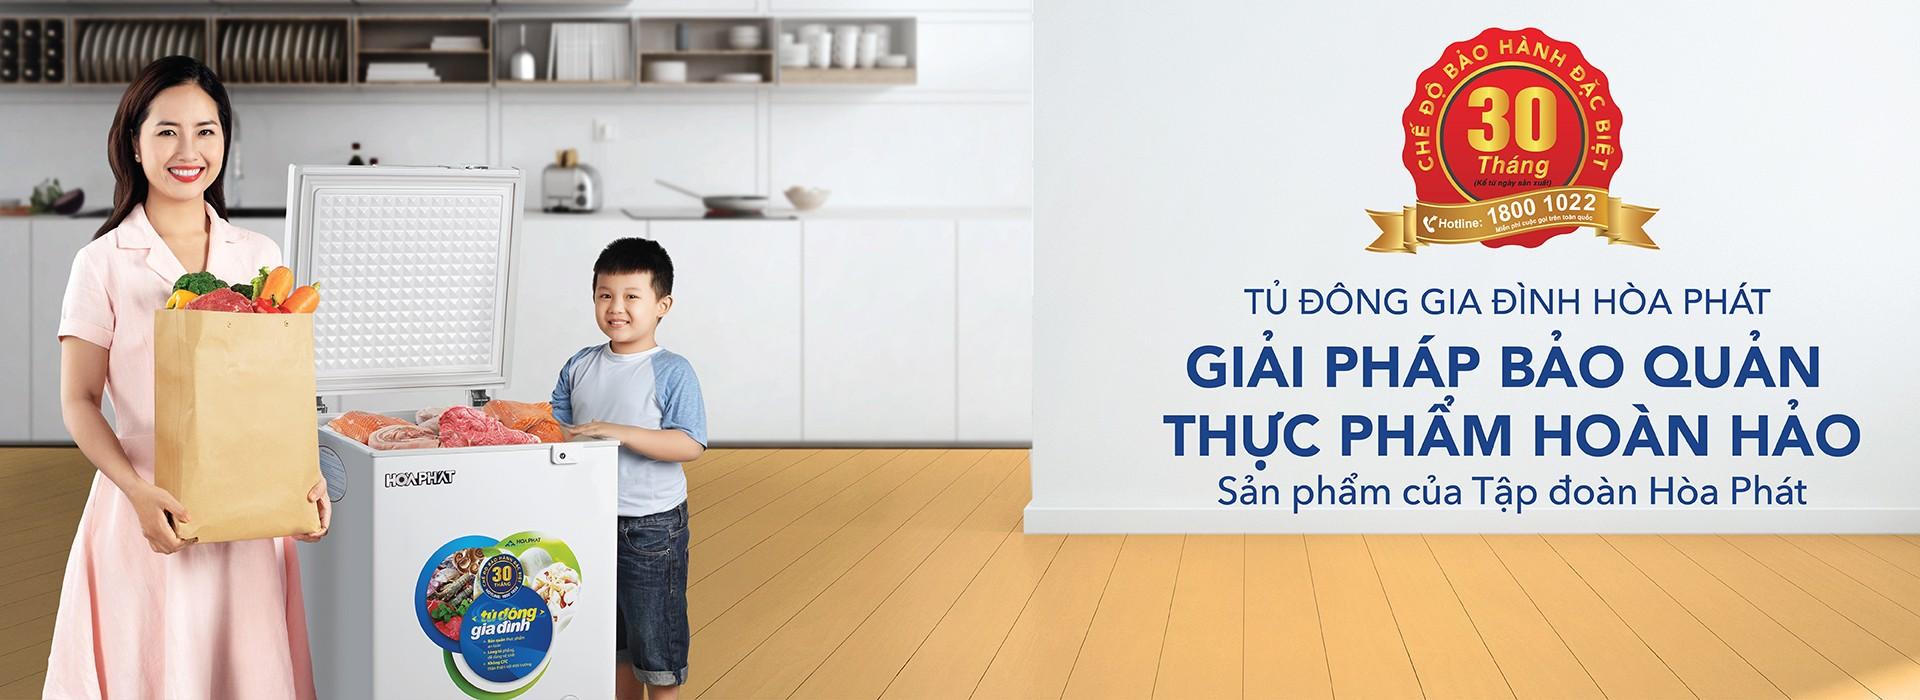 banne-web-tu-dong-2020-02-1